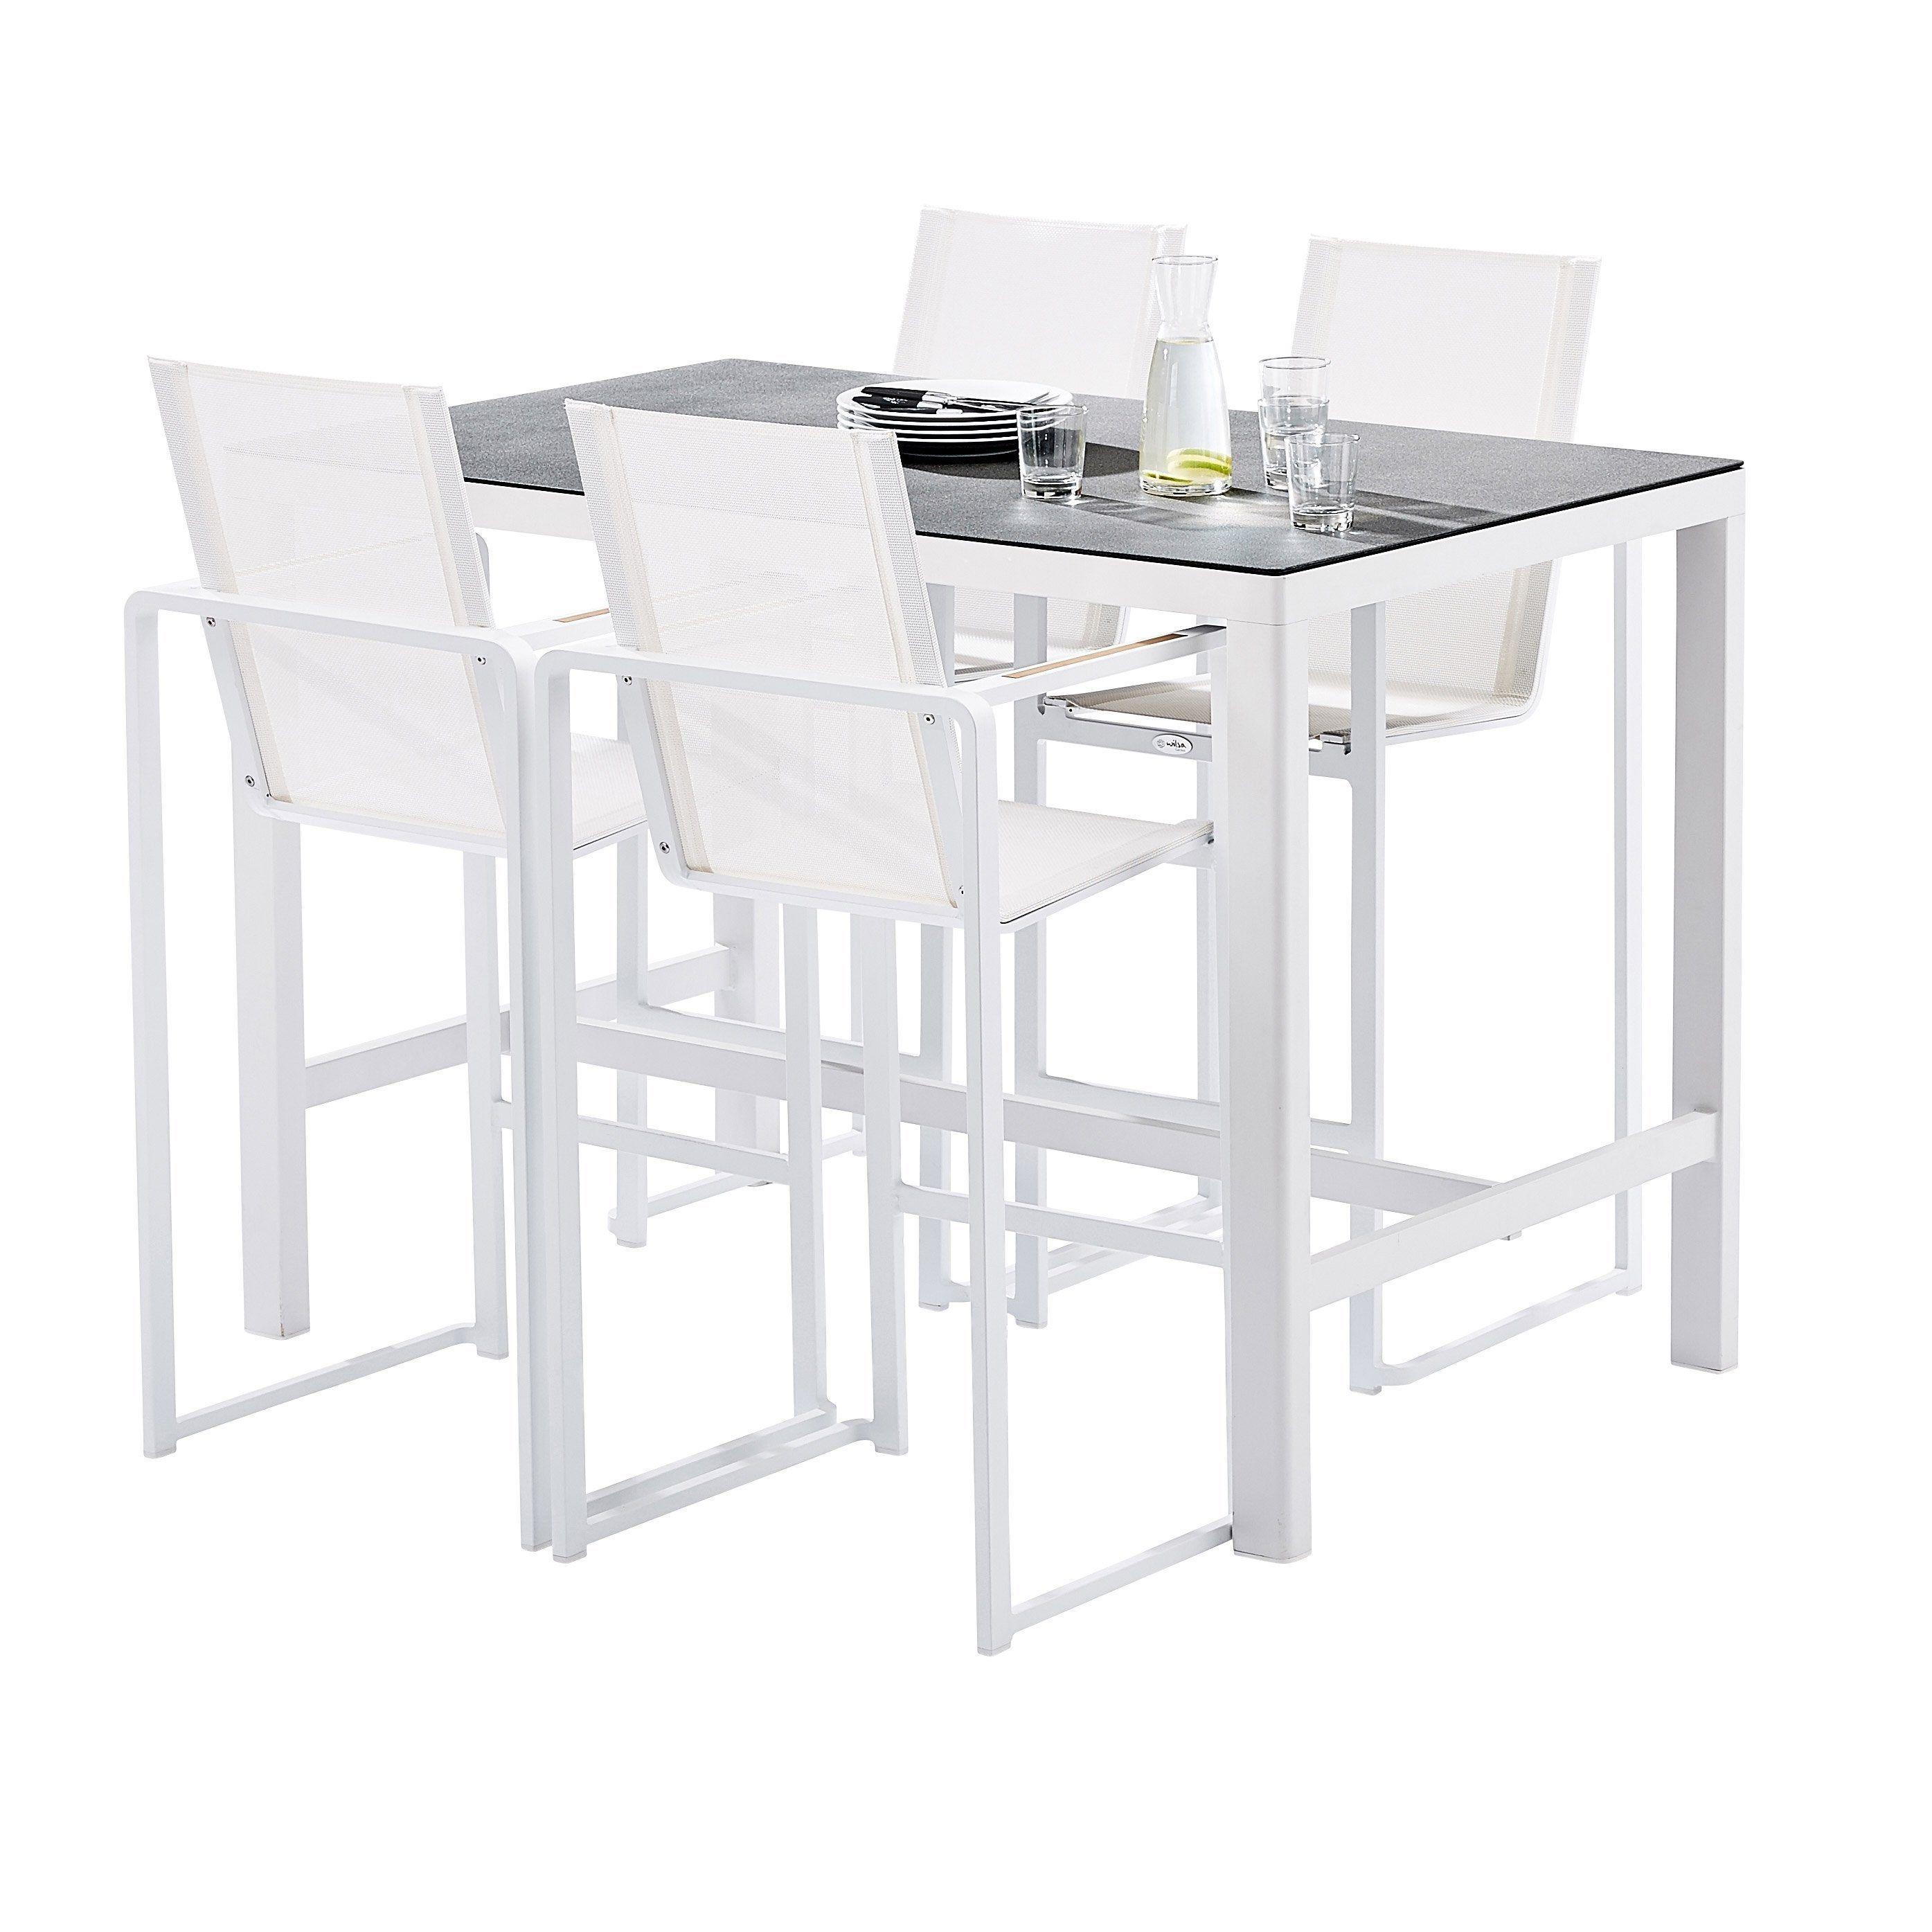 Salon De Jardin Wilsa Barset Haut T4 Aluminium Blanc 4 Personnes